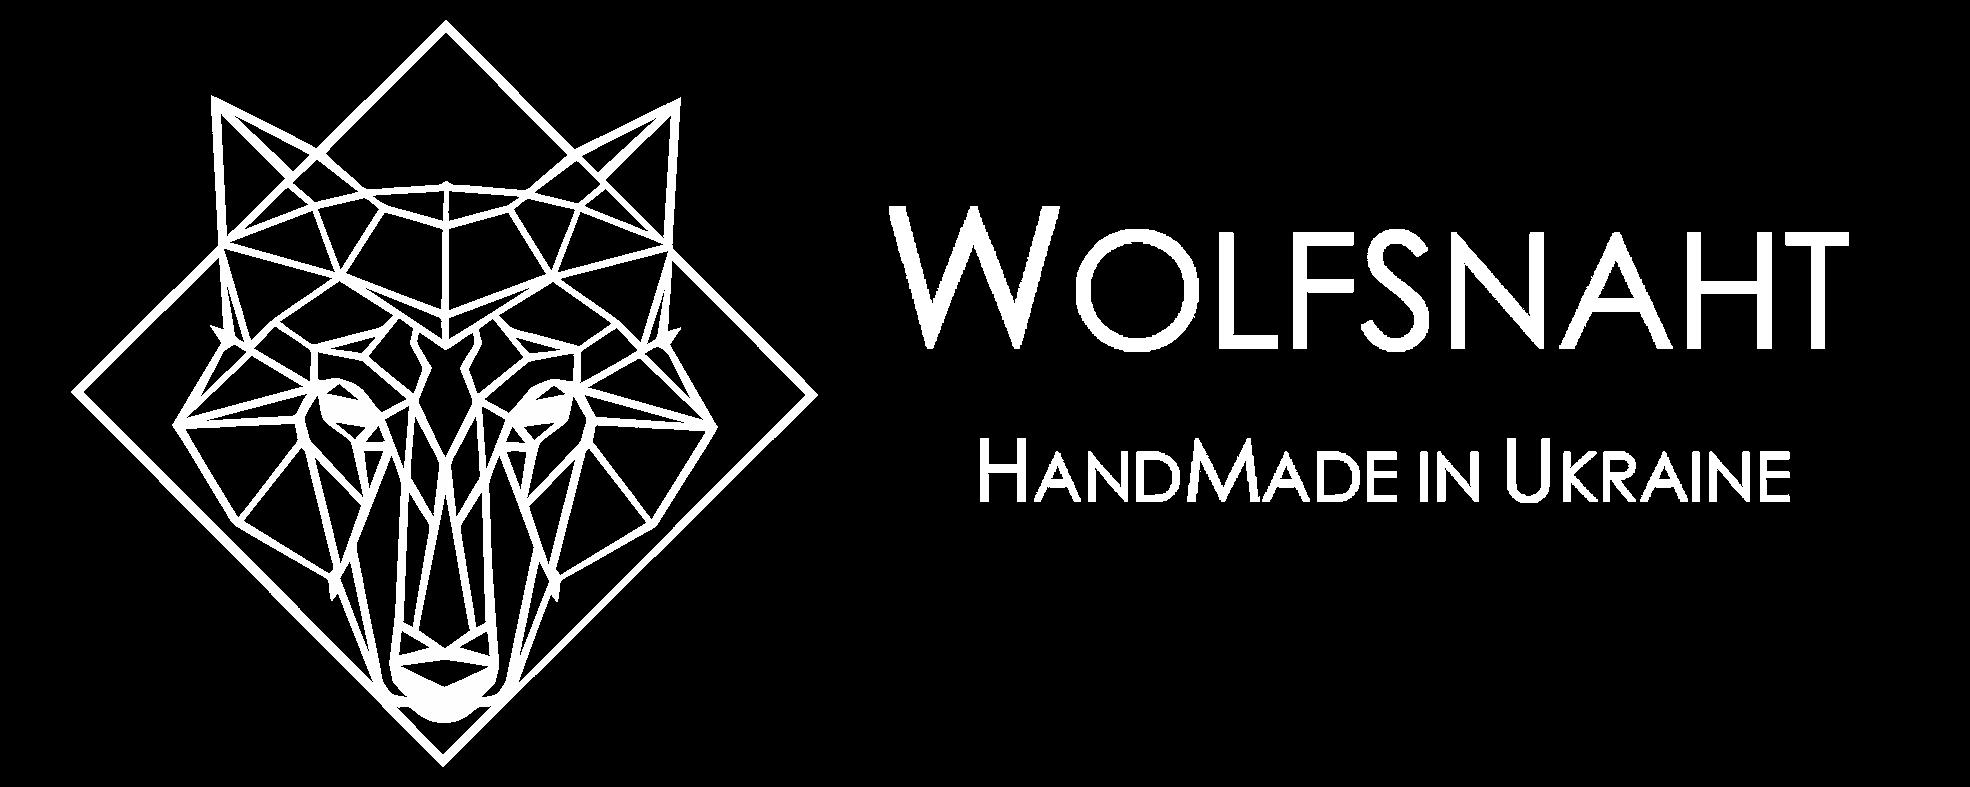 wolfsnaht